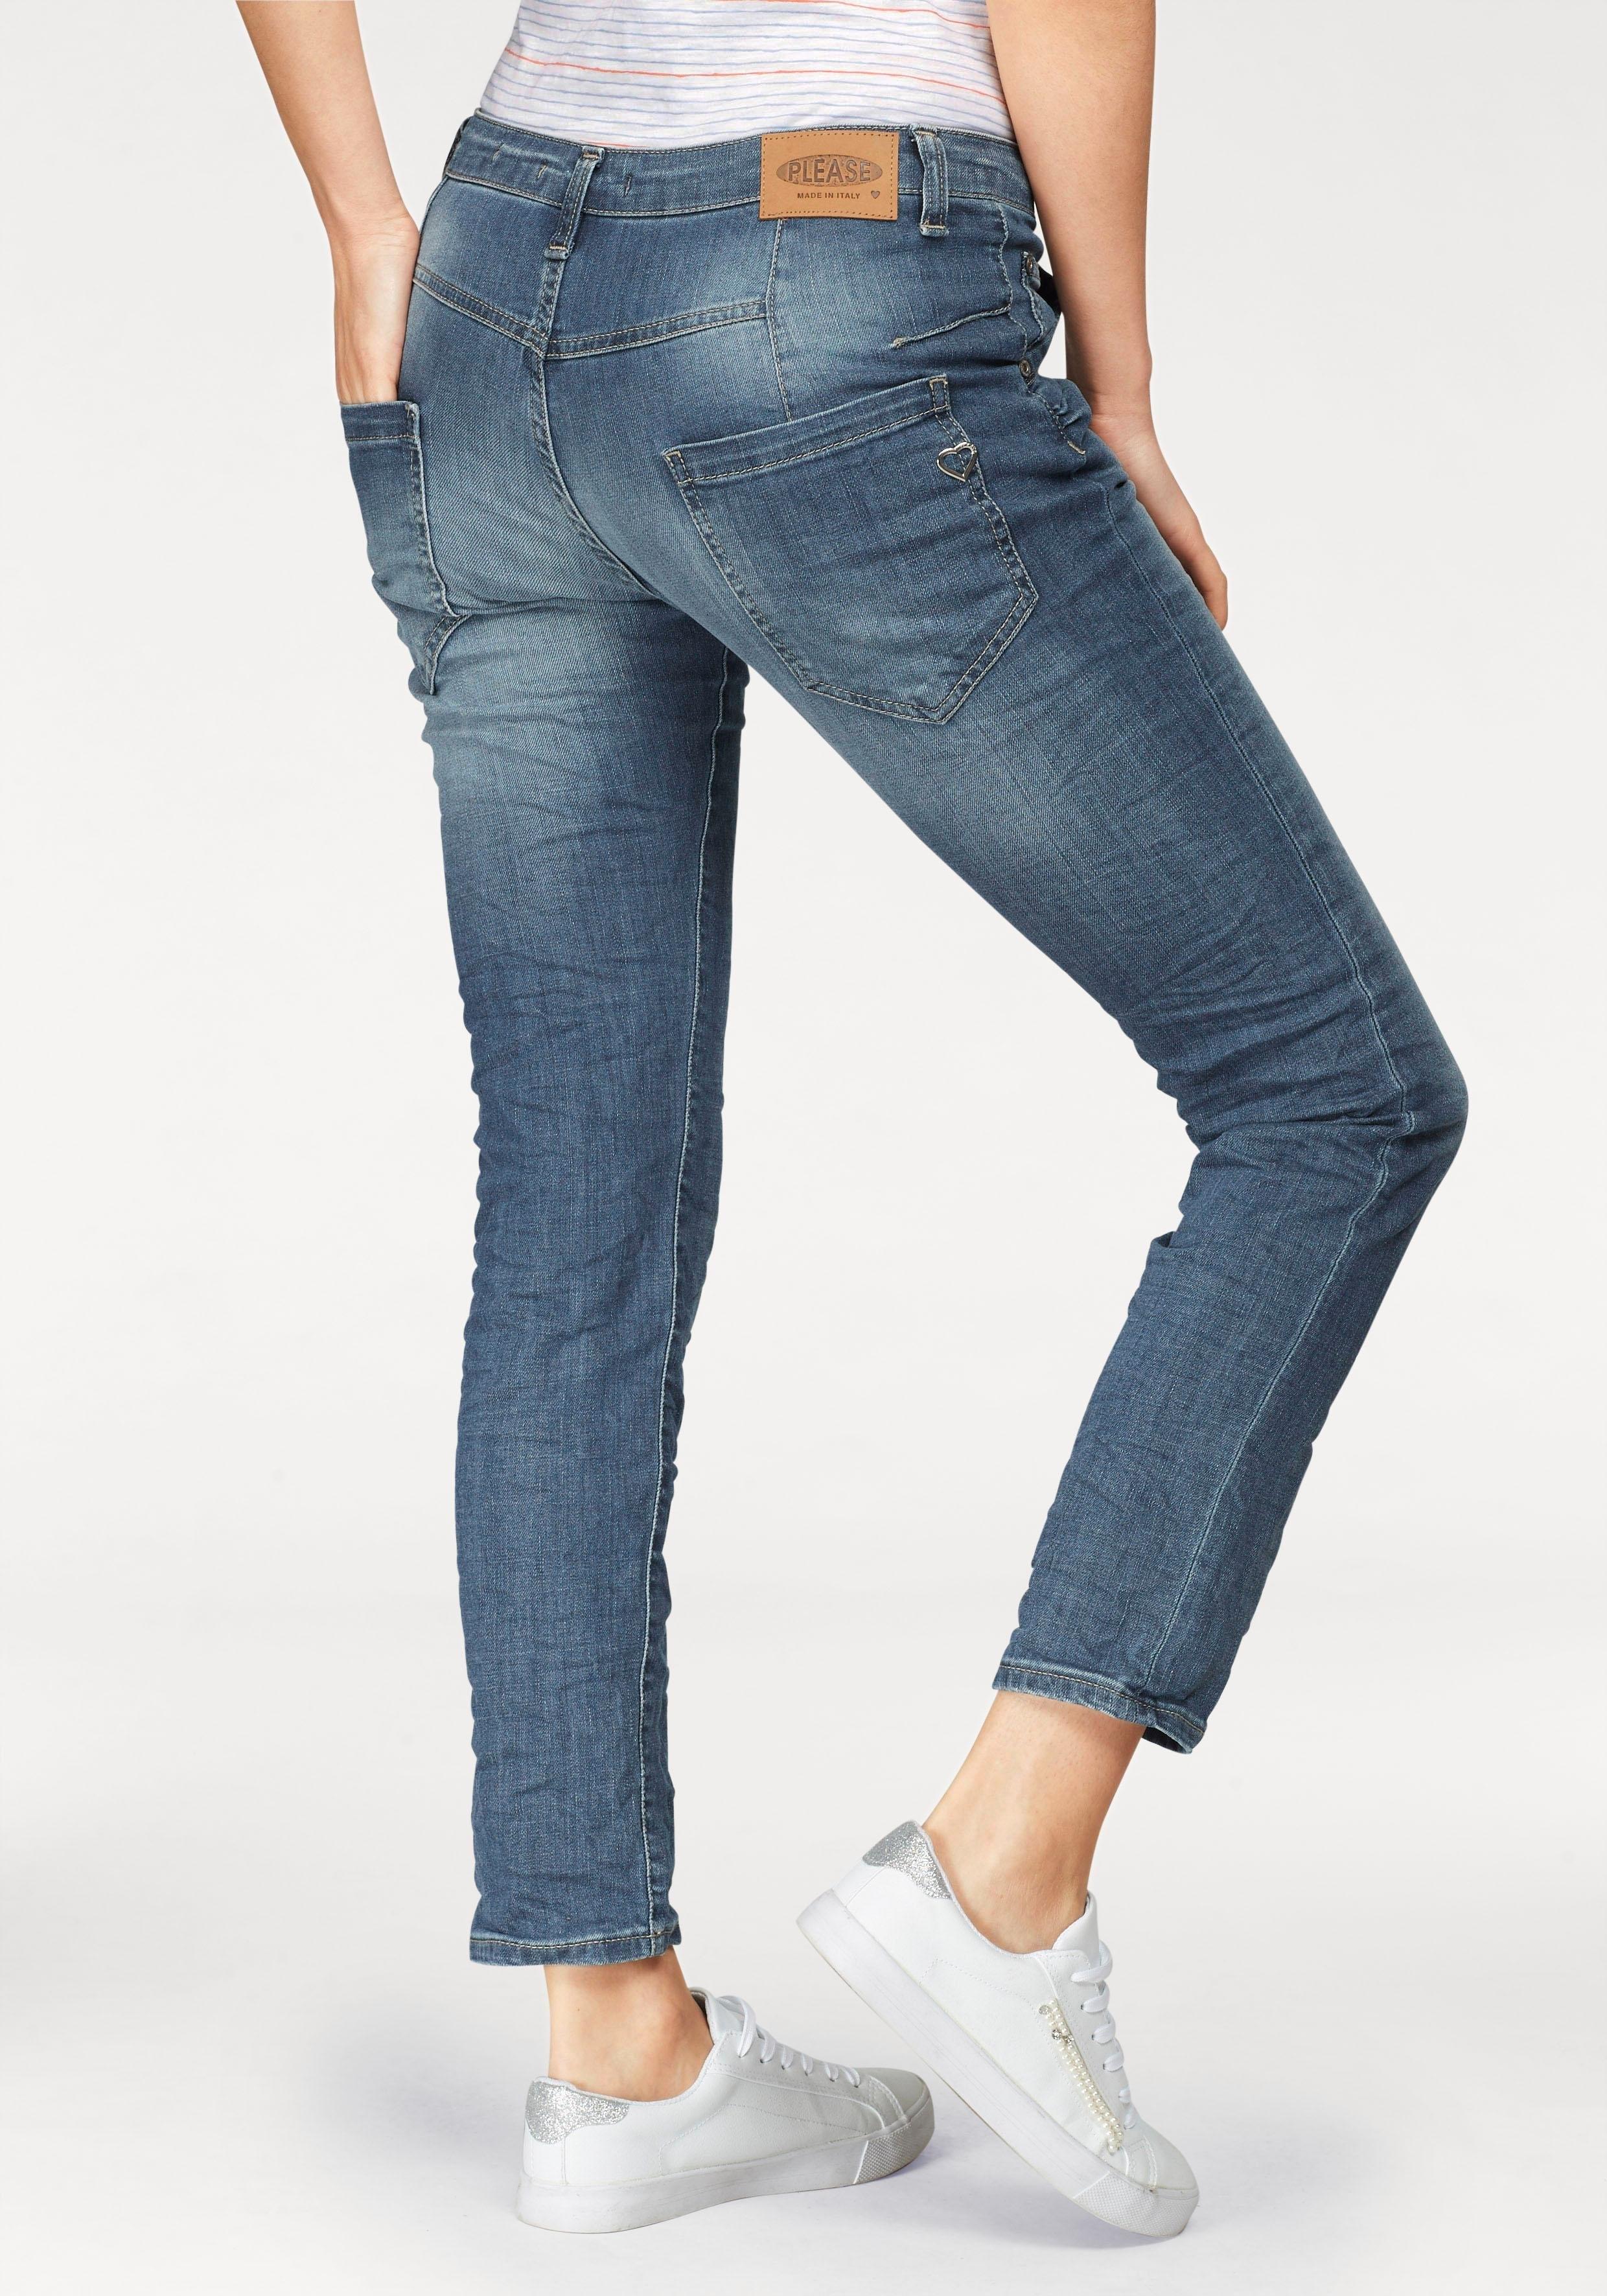 Please Jeans boyfriendjeans P85A casual jeans broek met gekreukt effect en oprolbare pijpen veilig op otto.nl kopen